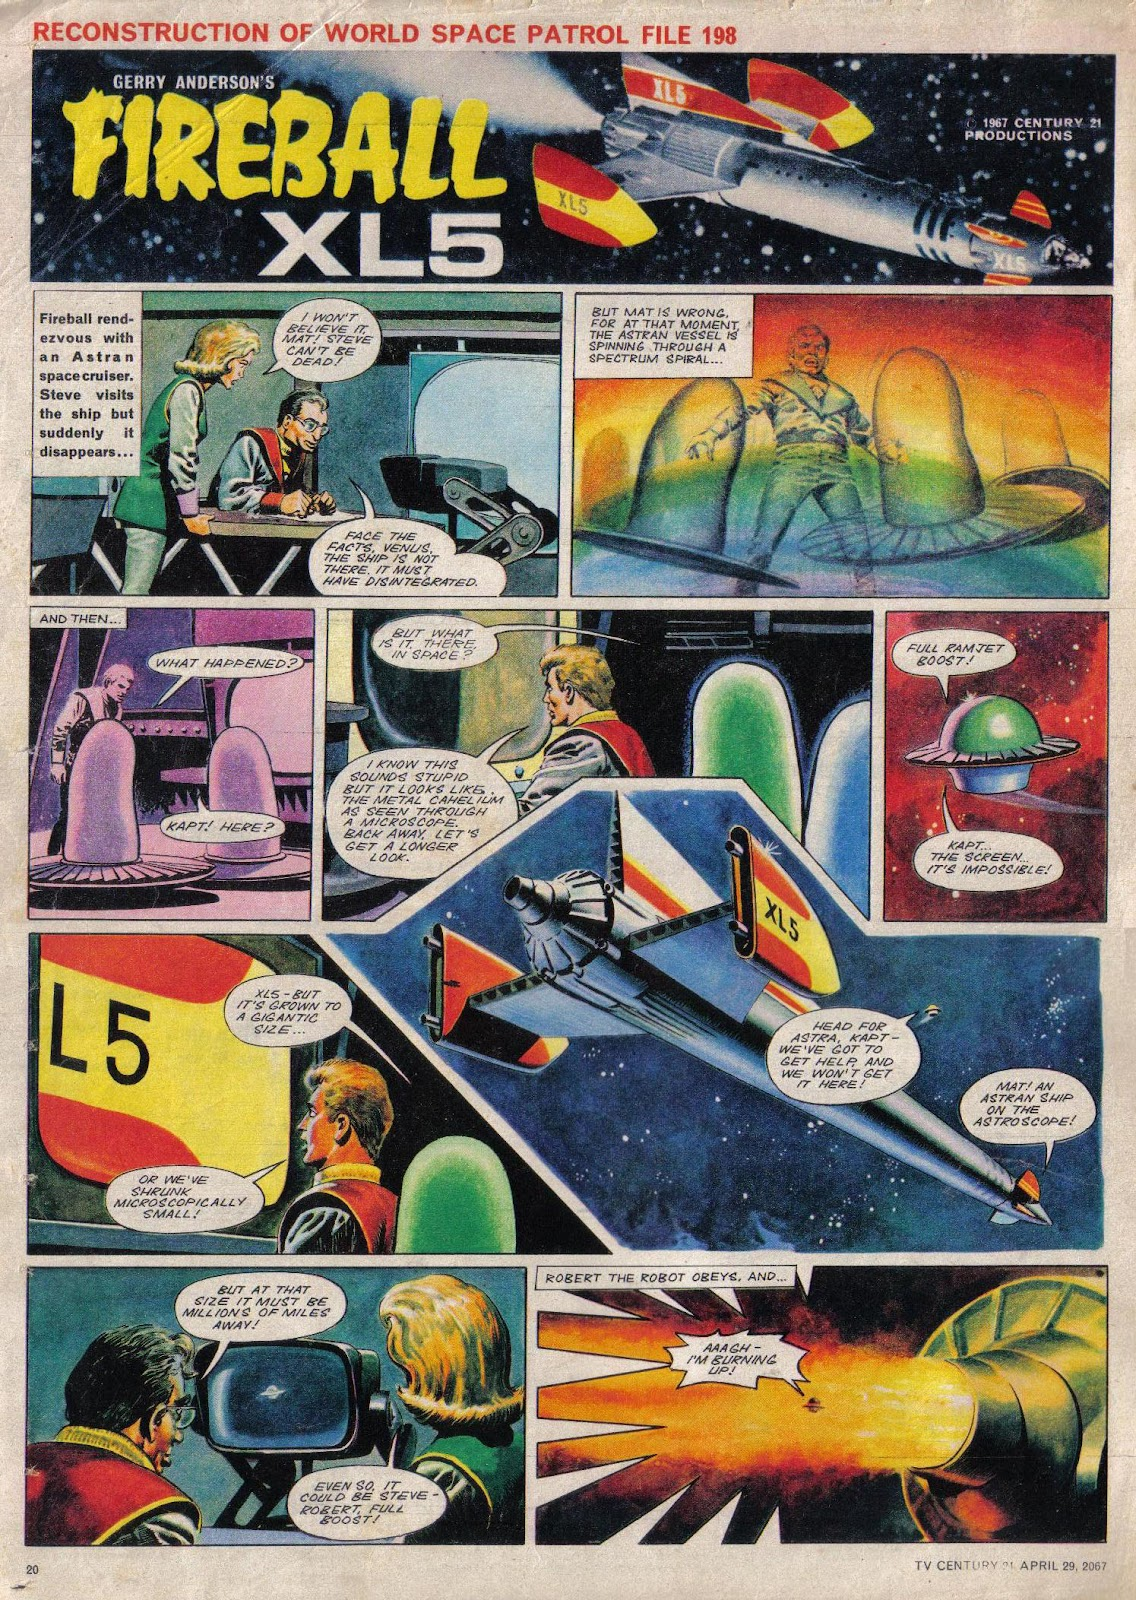 TV Century 21 (TV 21) issue 119 - Page 19